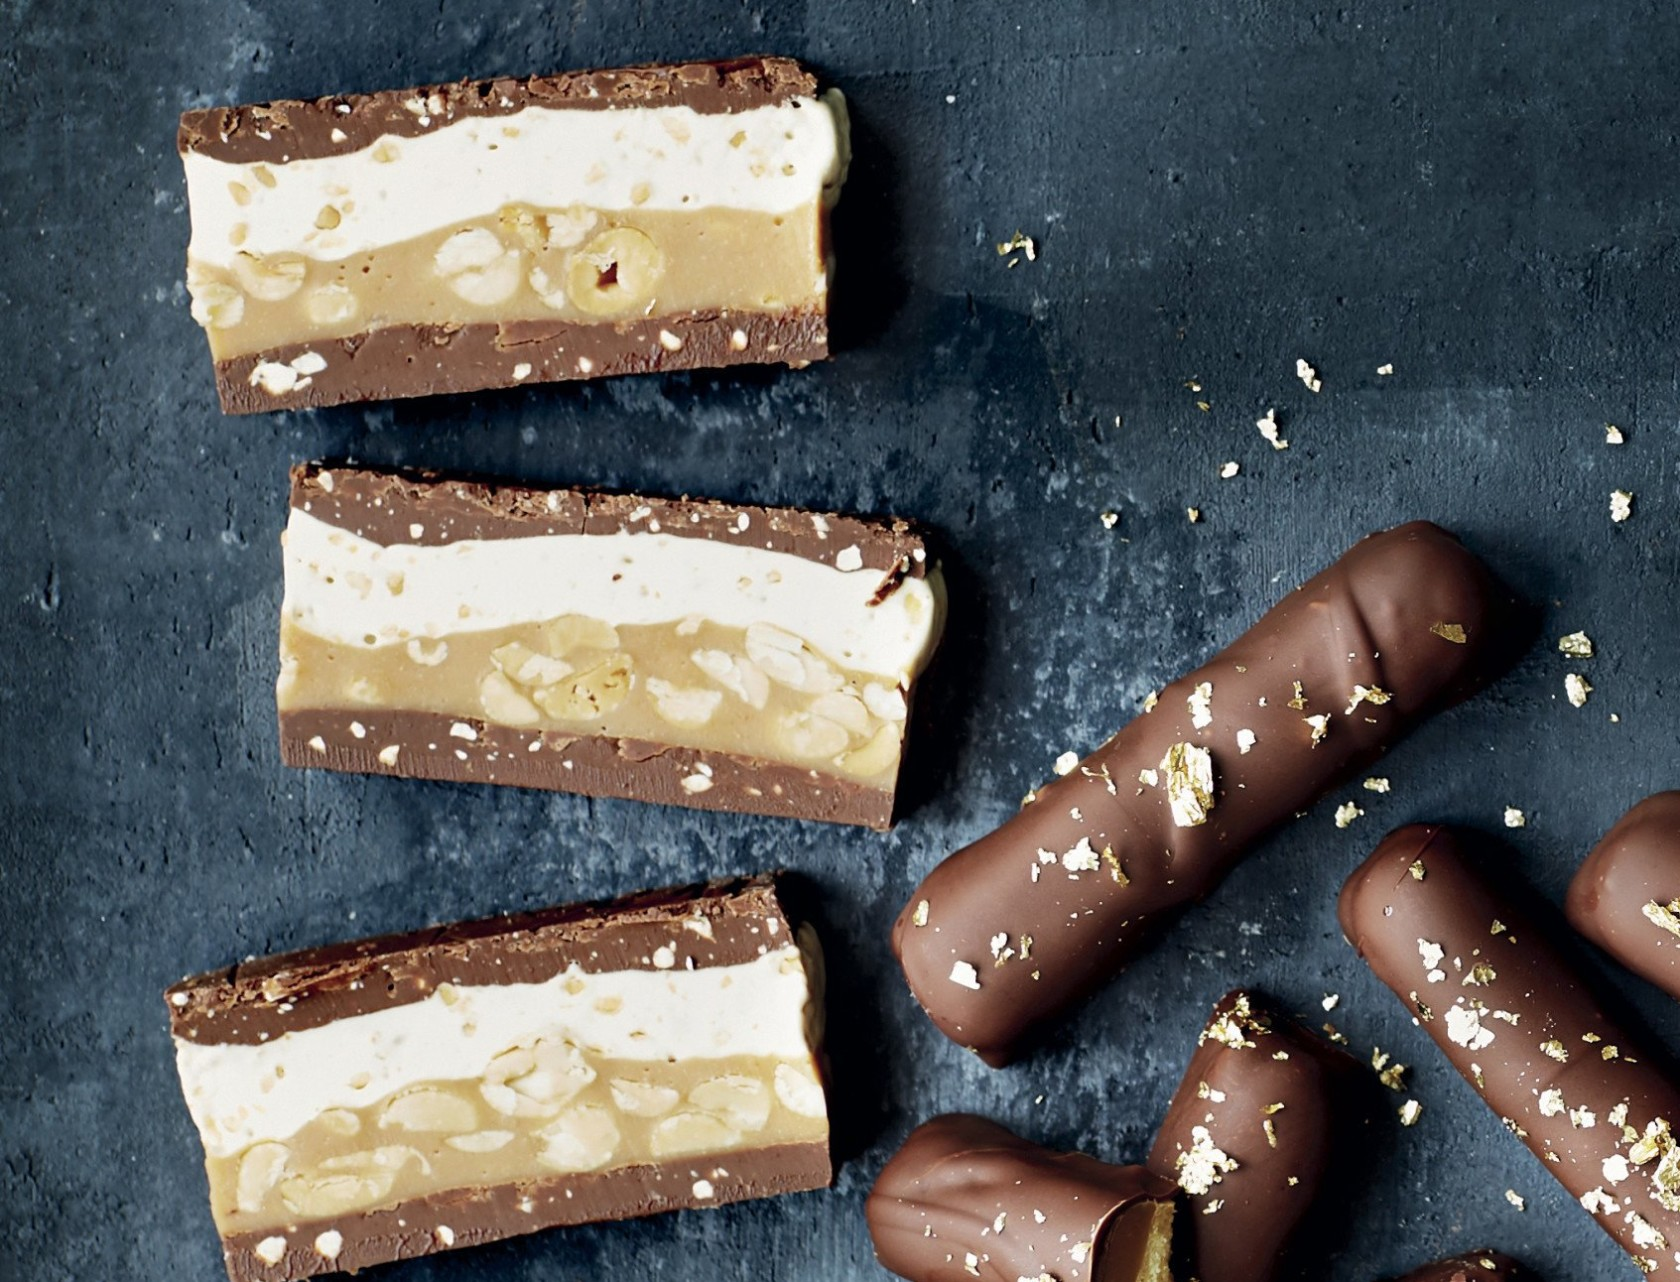 Hjemmelavede snickers med peanutbutter - nem opskrift på chokoladebar.